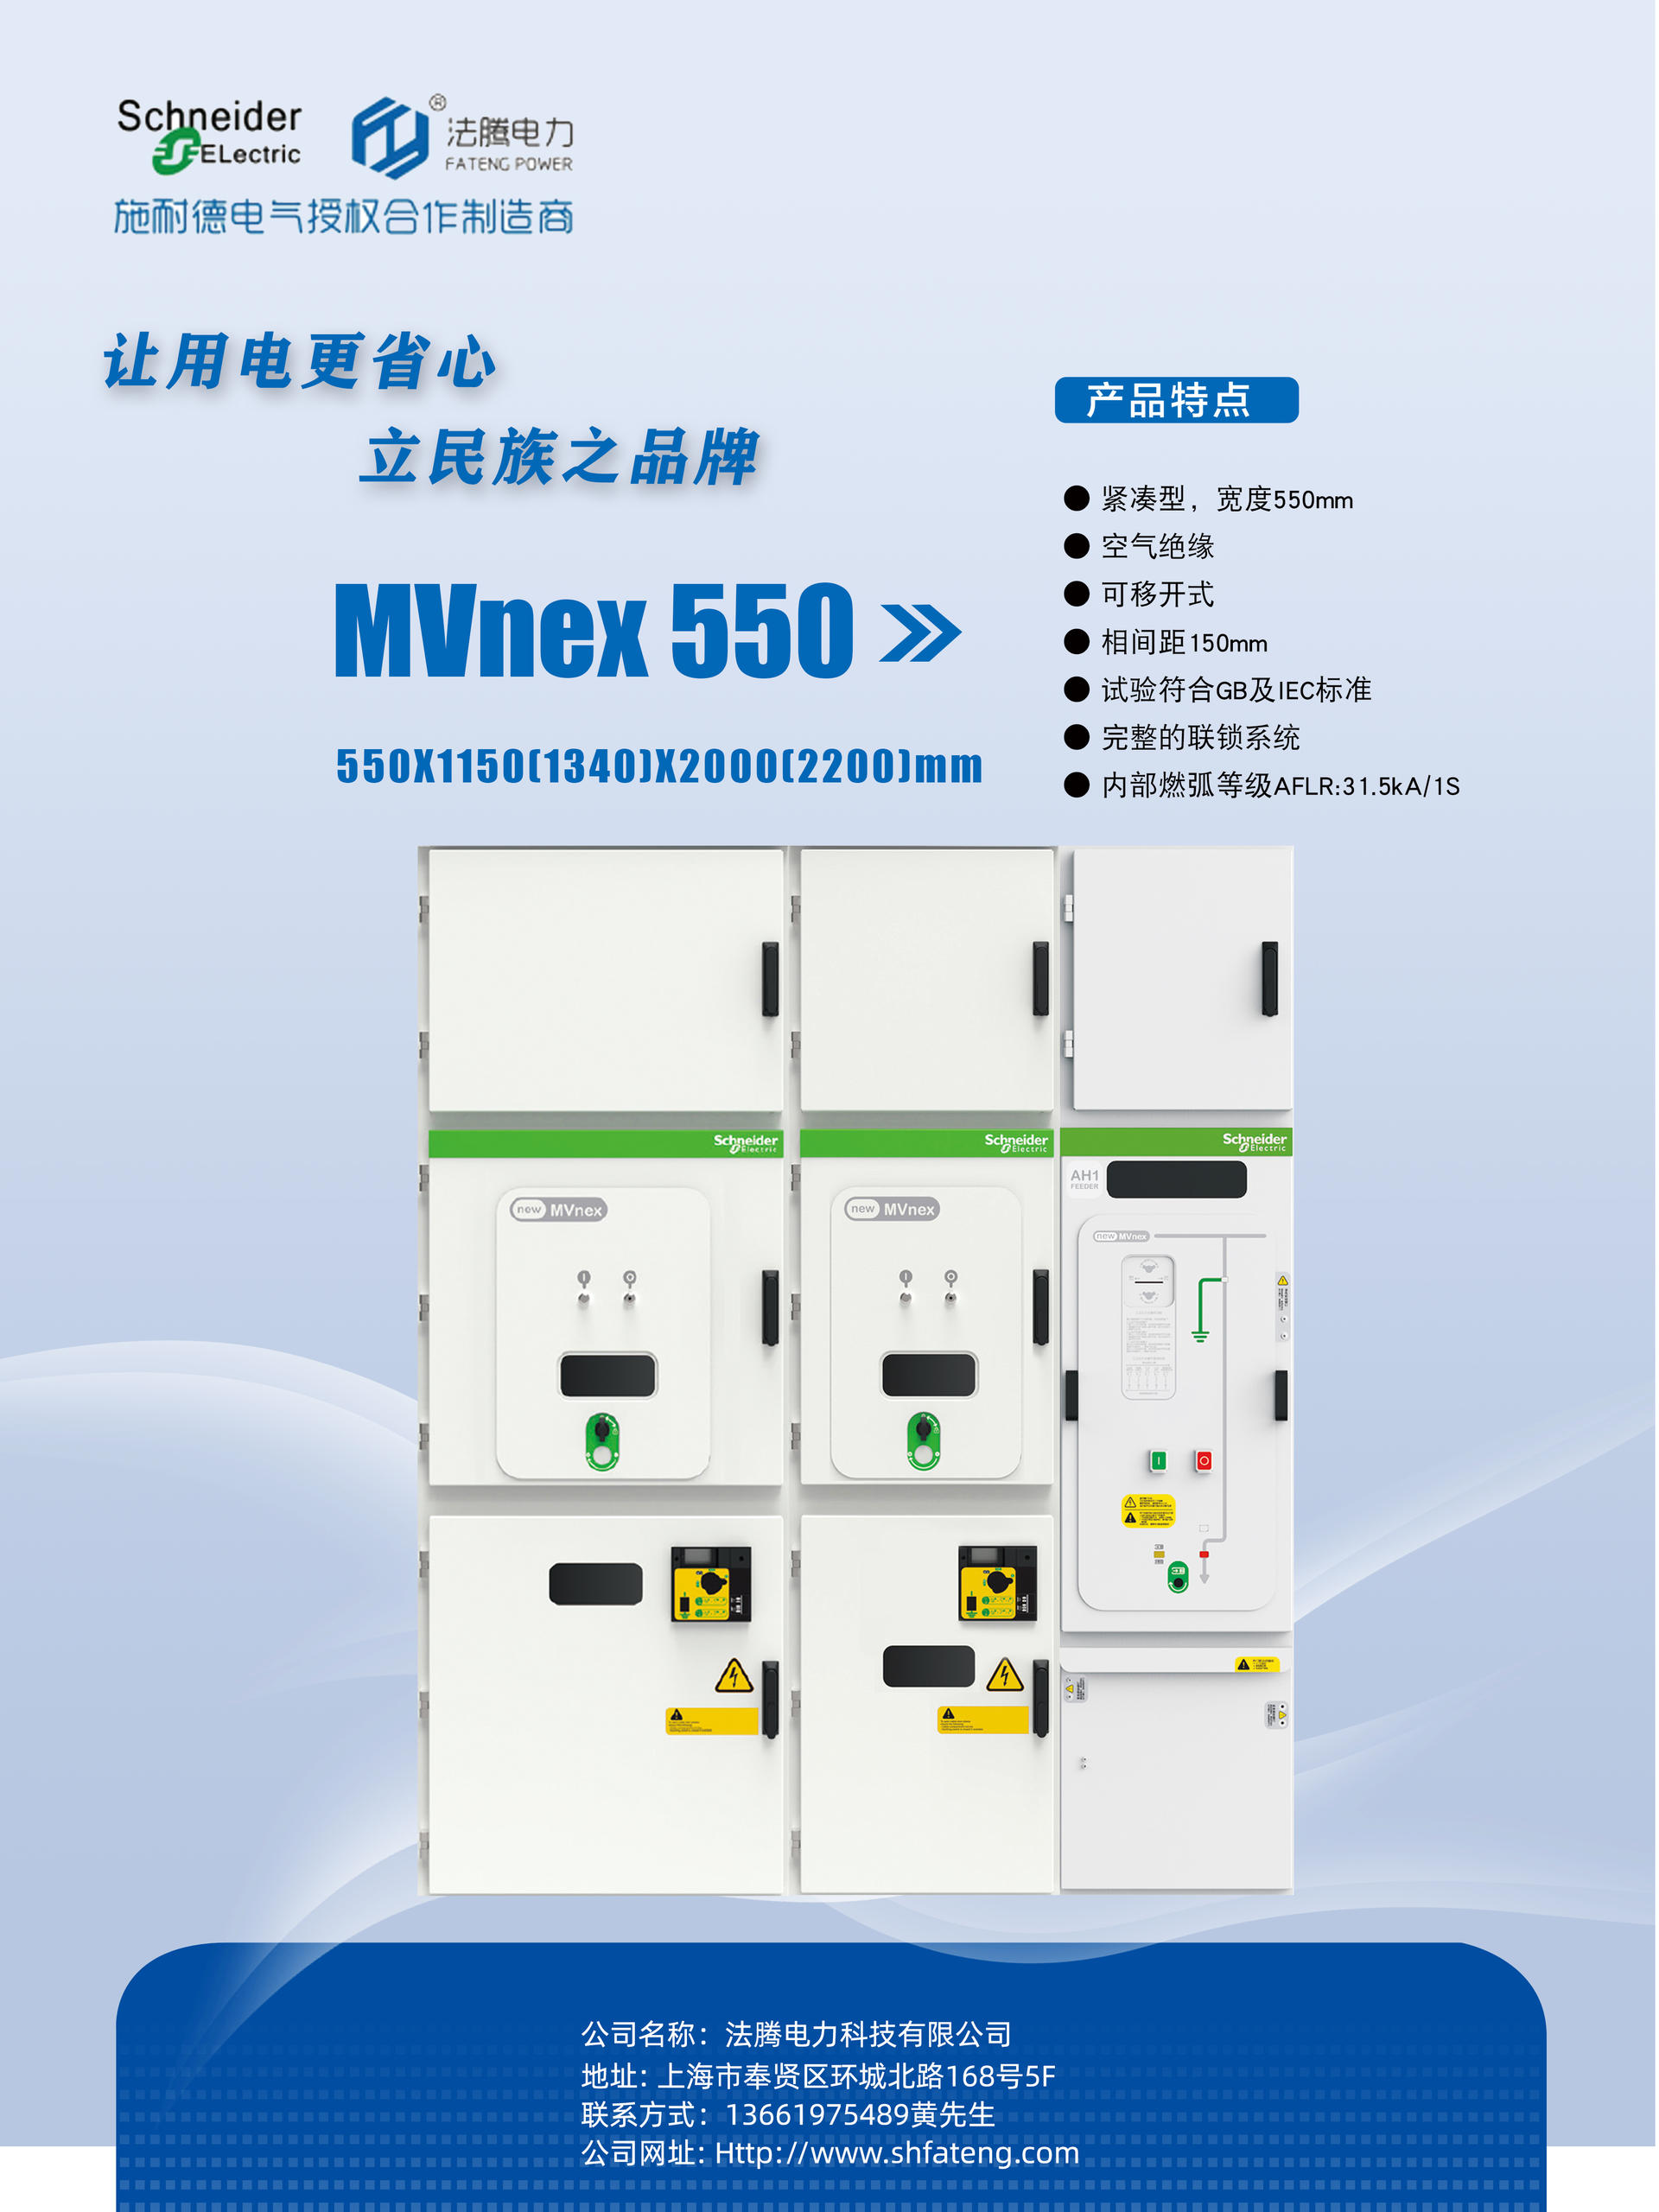 Schneider/施耐德授权MVnex-12 MVnex550-12中压开关柜山东菏泽市KYN550工艺精湛预制舱示例图8